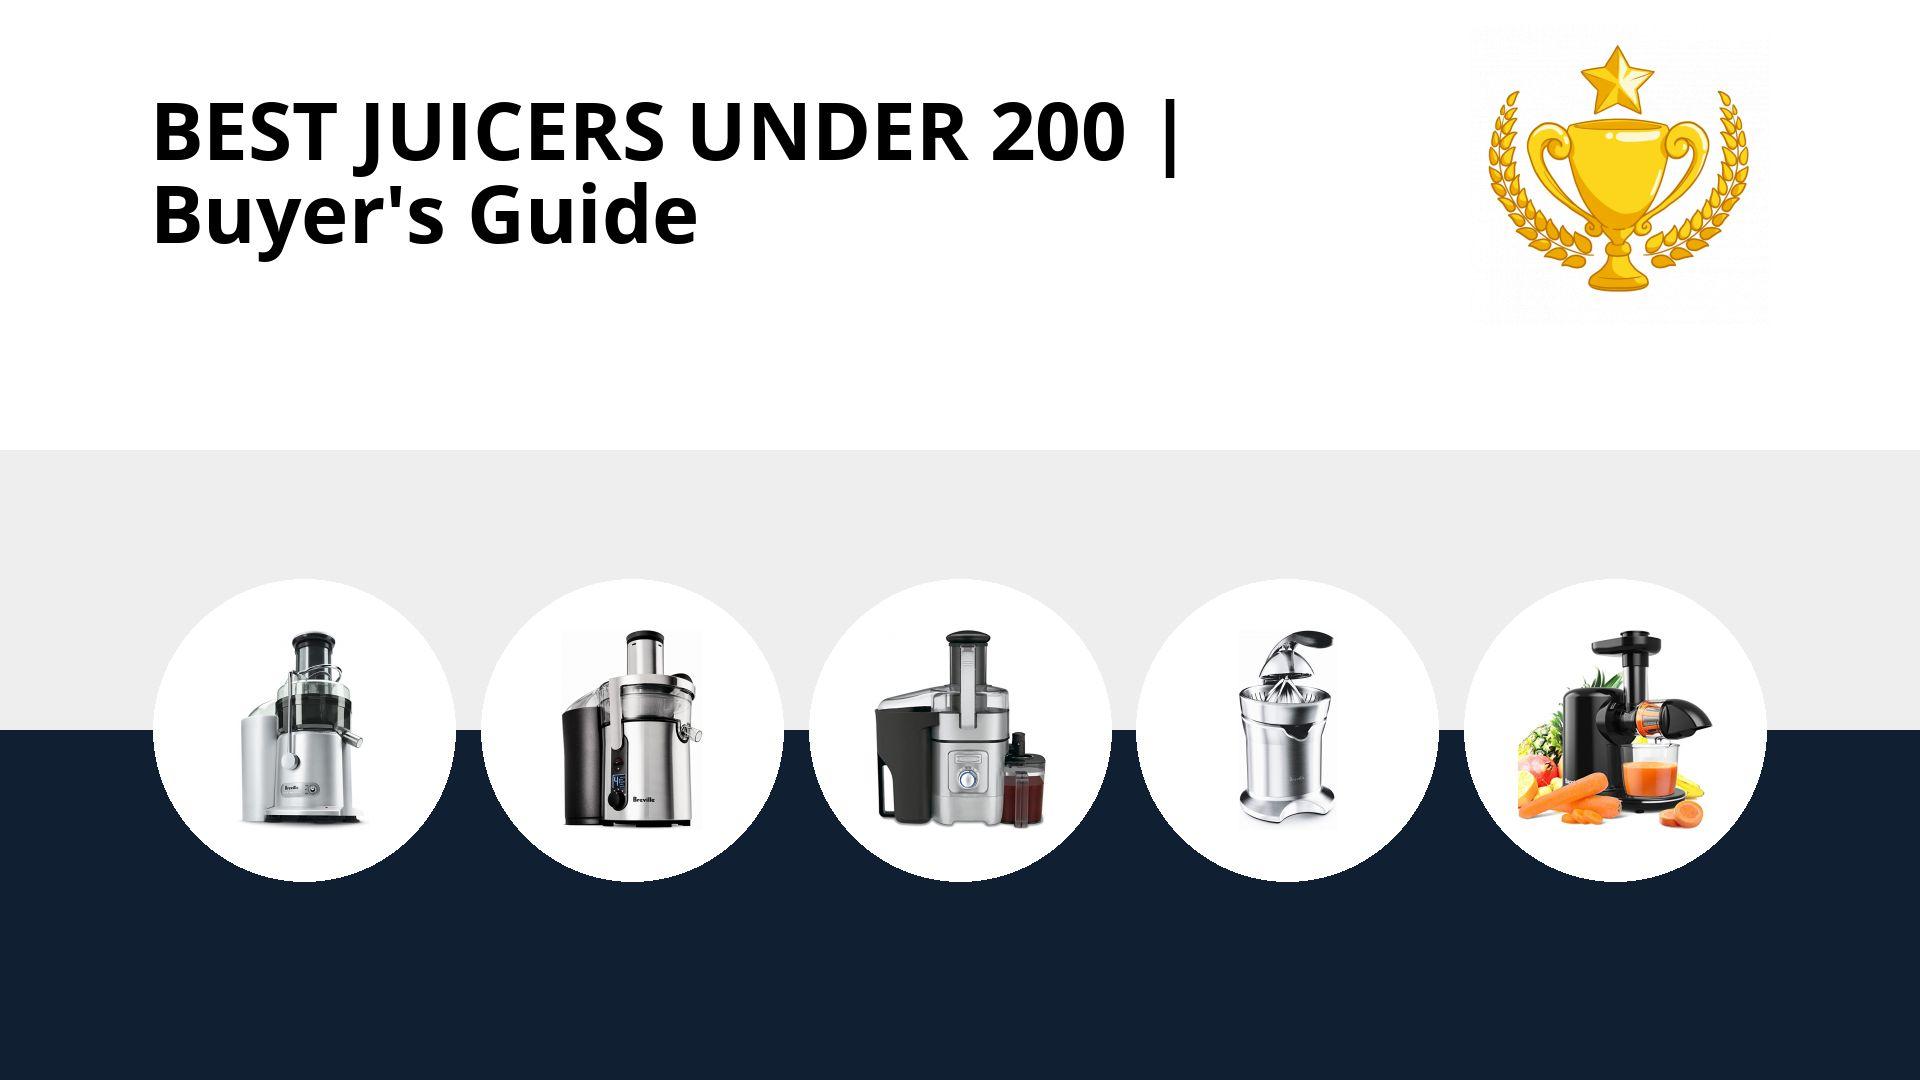 Best Juicers Under 200: image